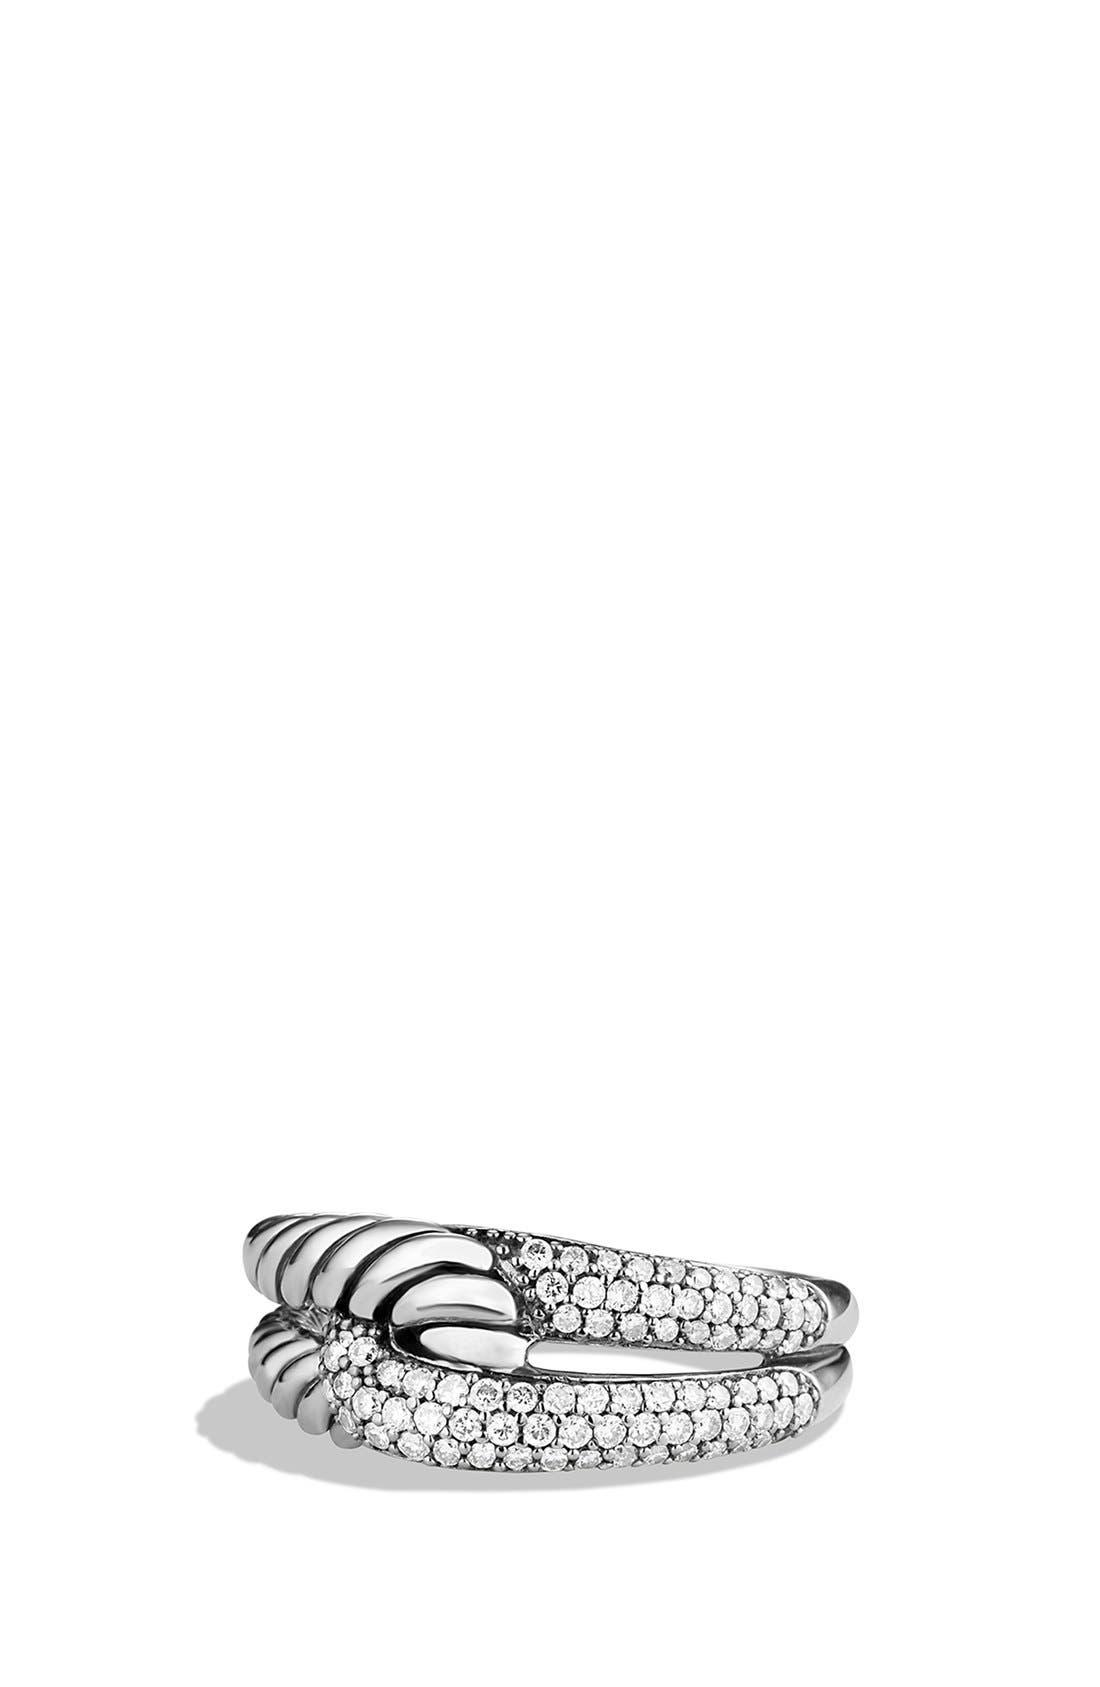 'Labyrinth' Single Loop Ring with Diamonds,                             Main thumbnail 1, color,                             Diamond